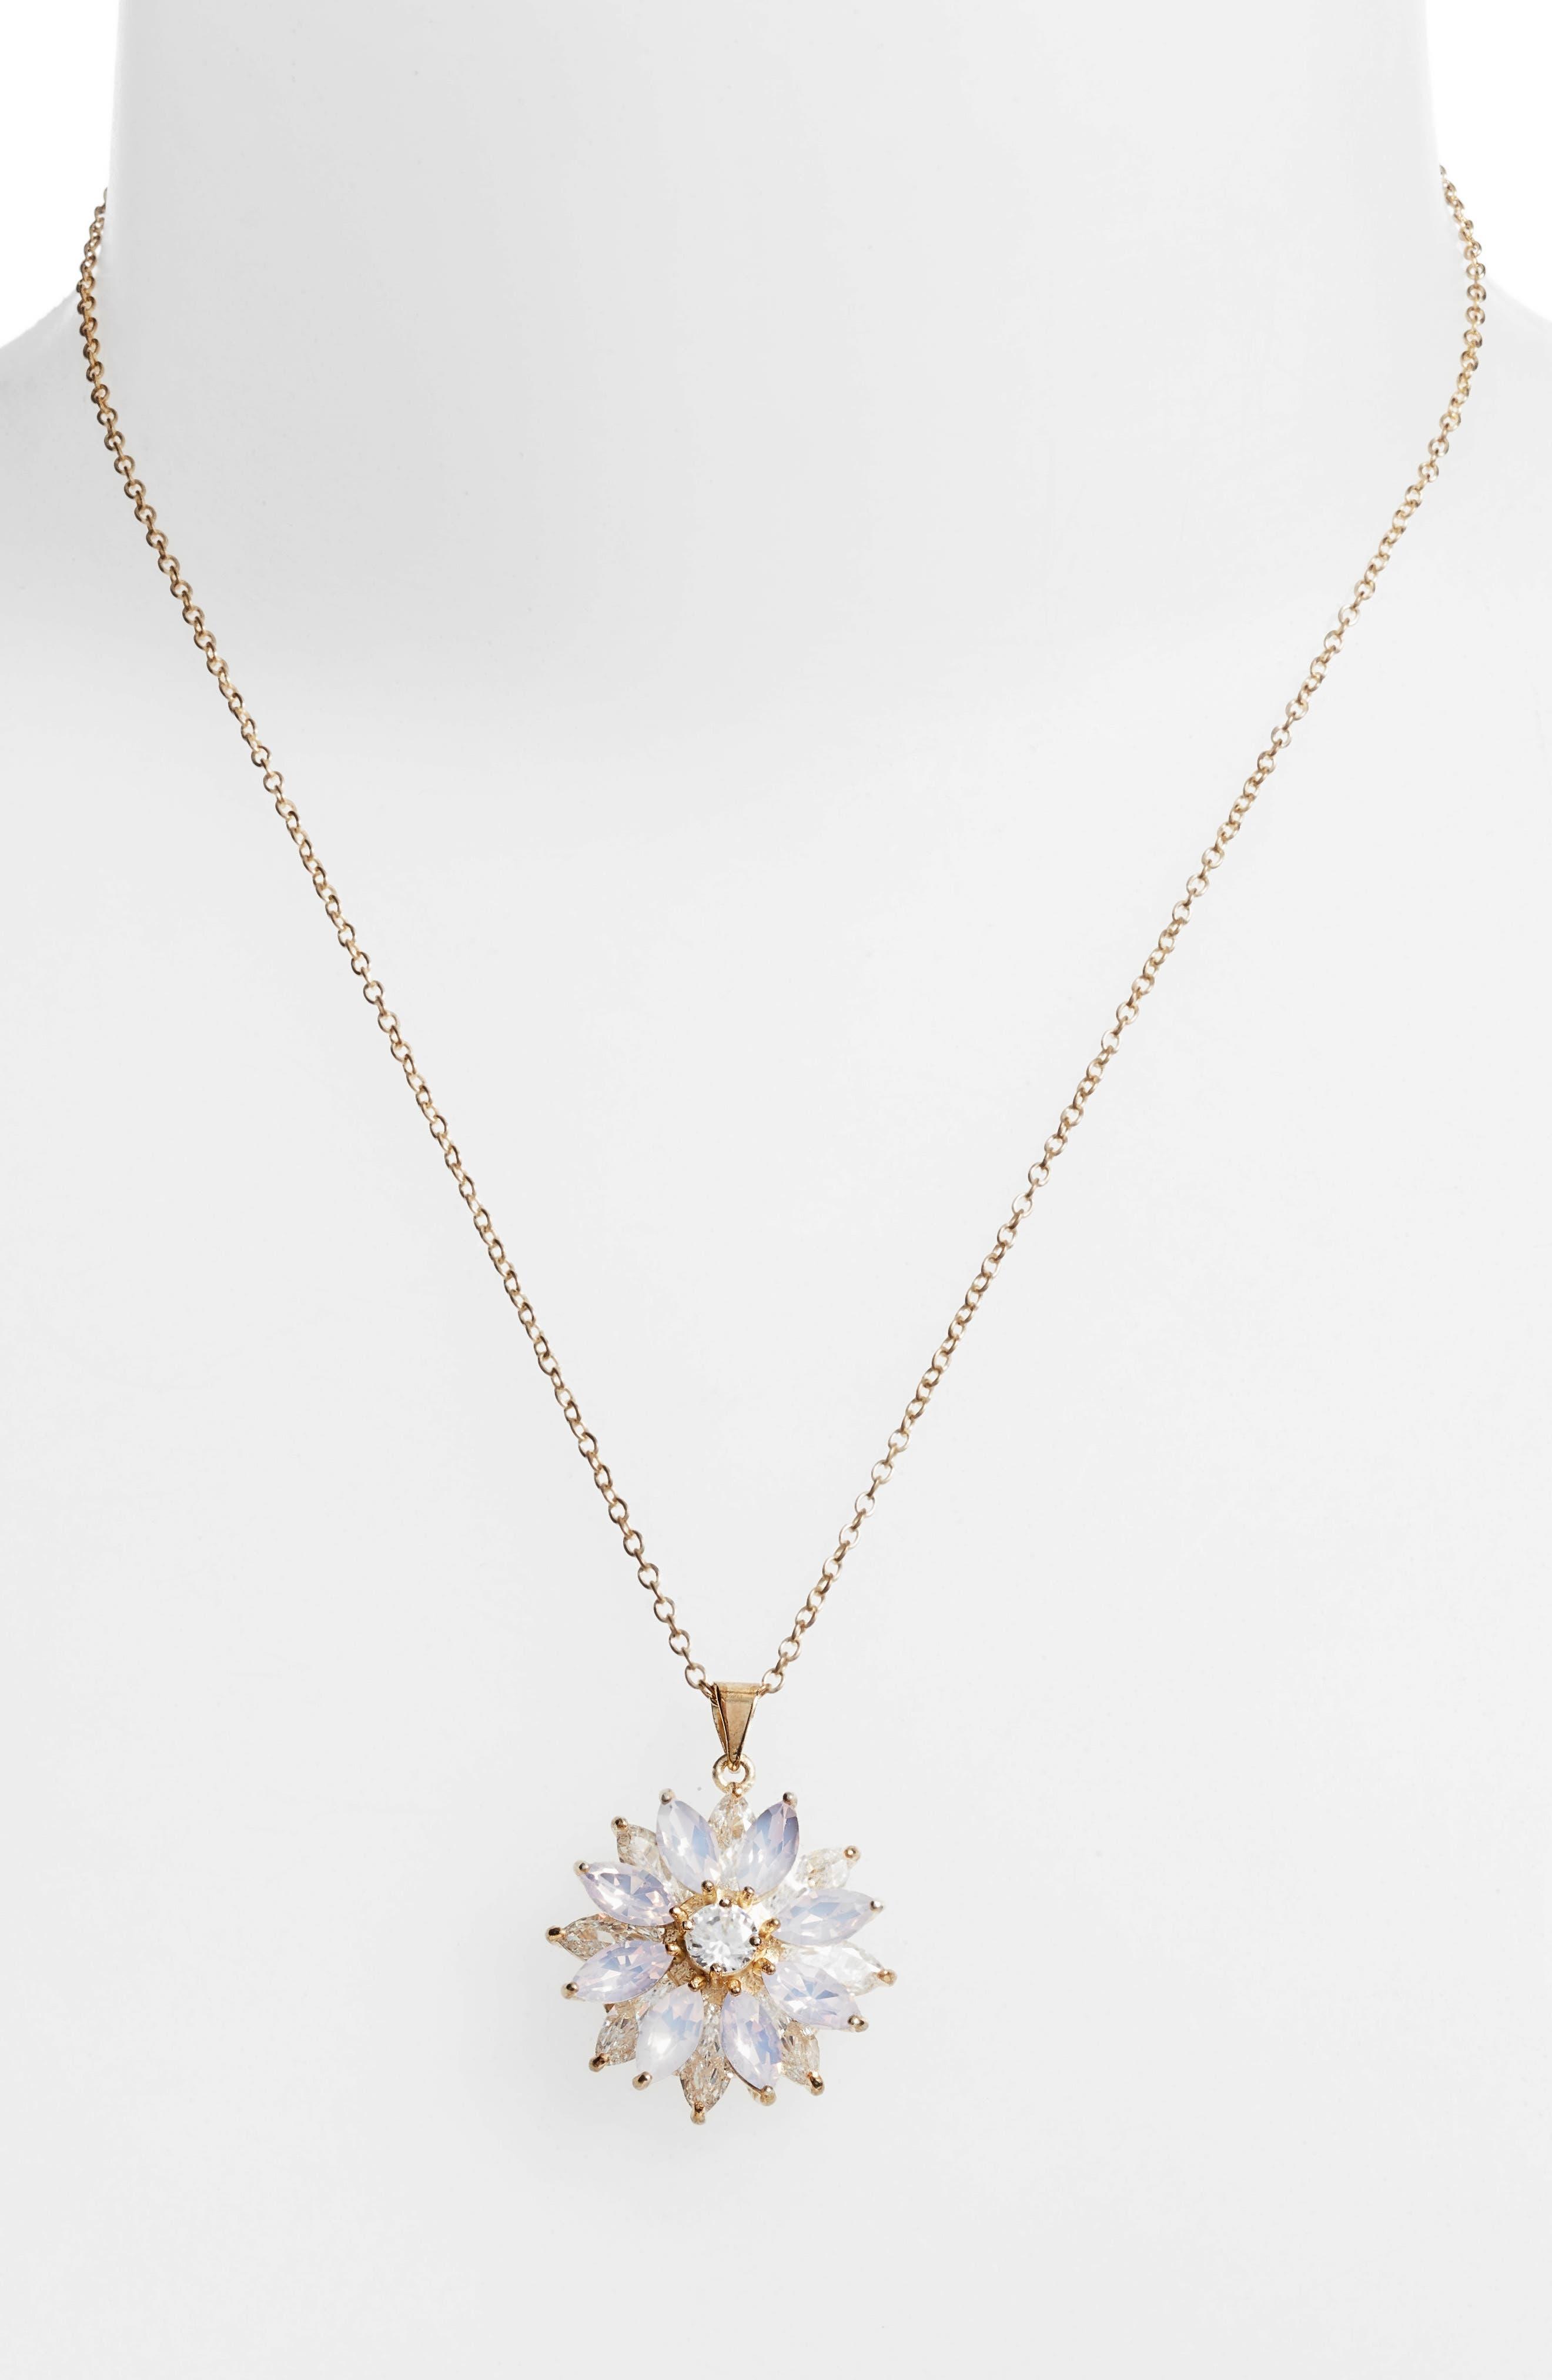 Layer Floral Pendant Necklace,                             Alternate thumbnail 2, color,                             PINK OPAL/ GOLD